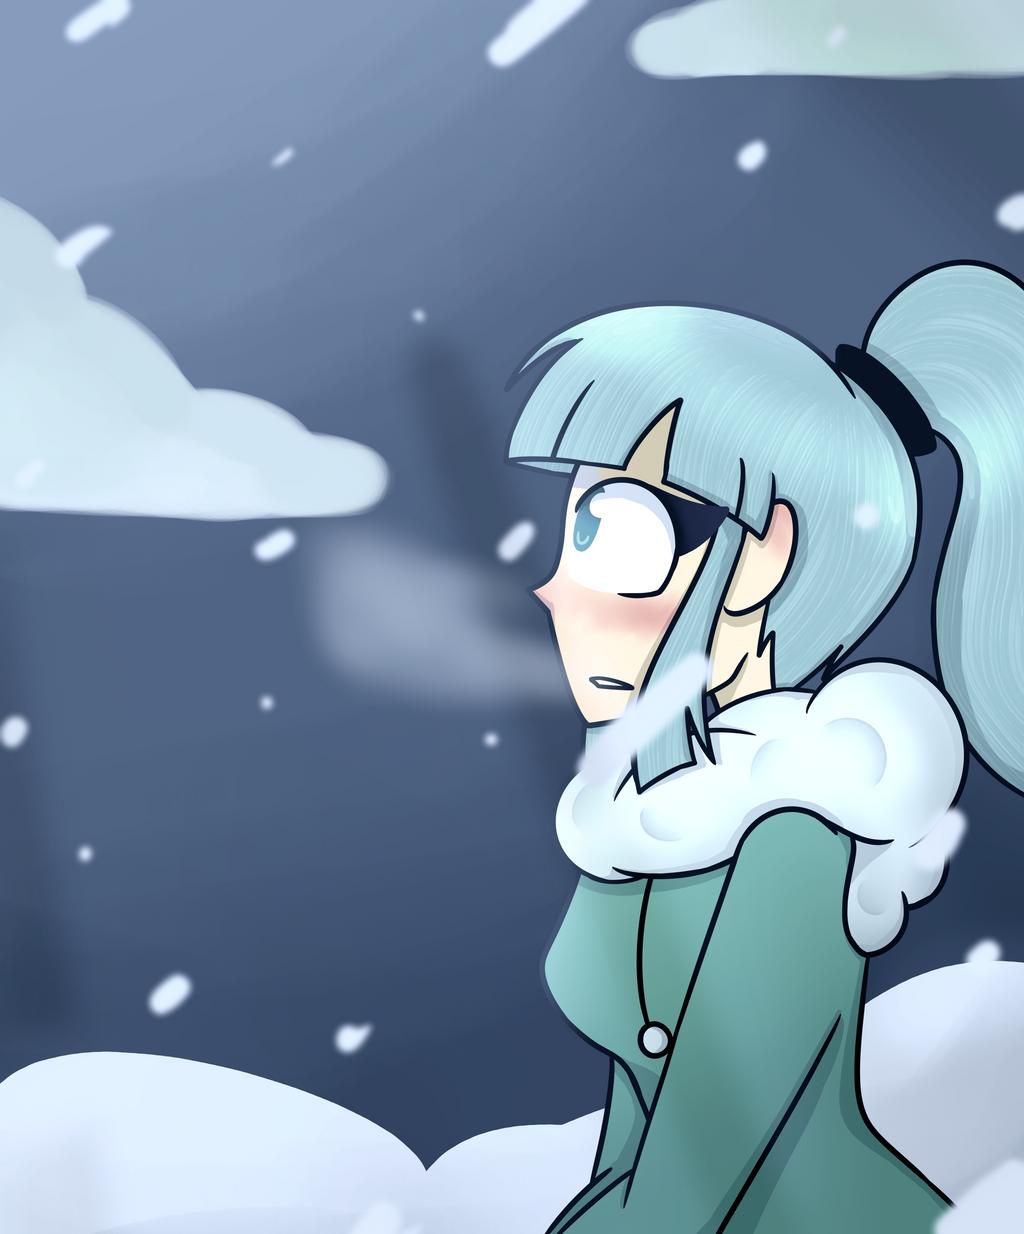 Winter by LoveMe2346